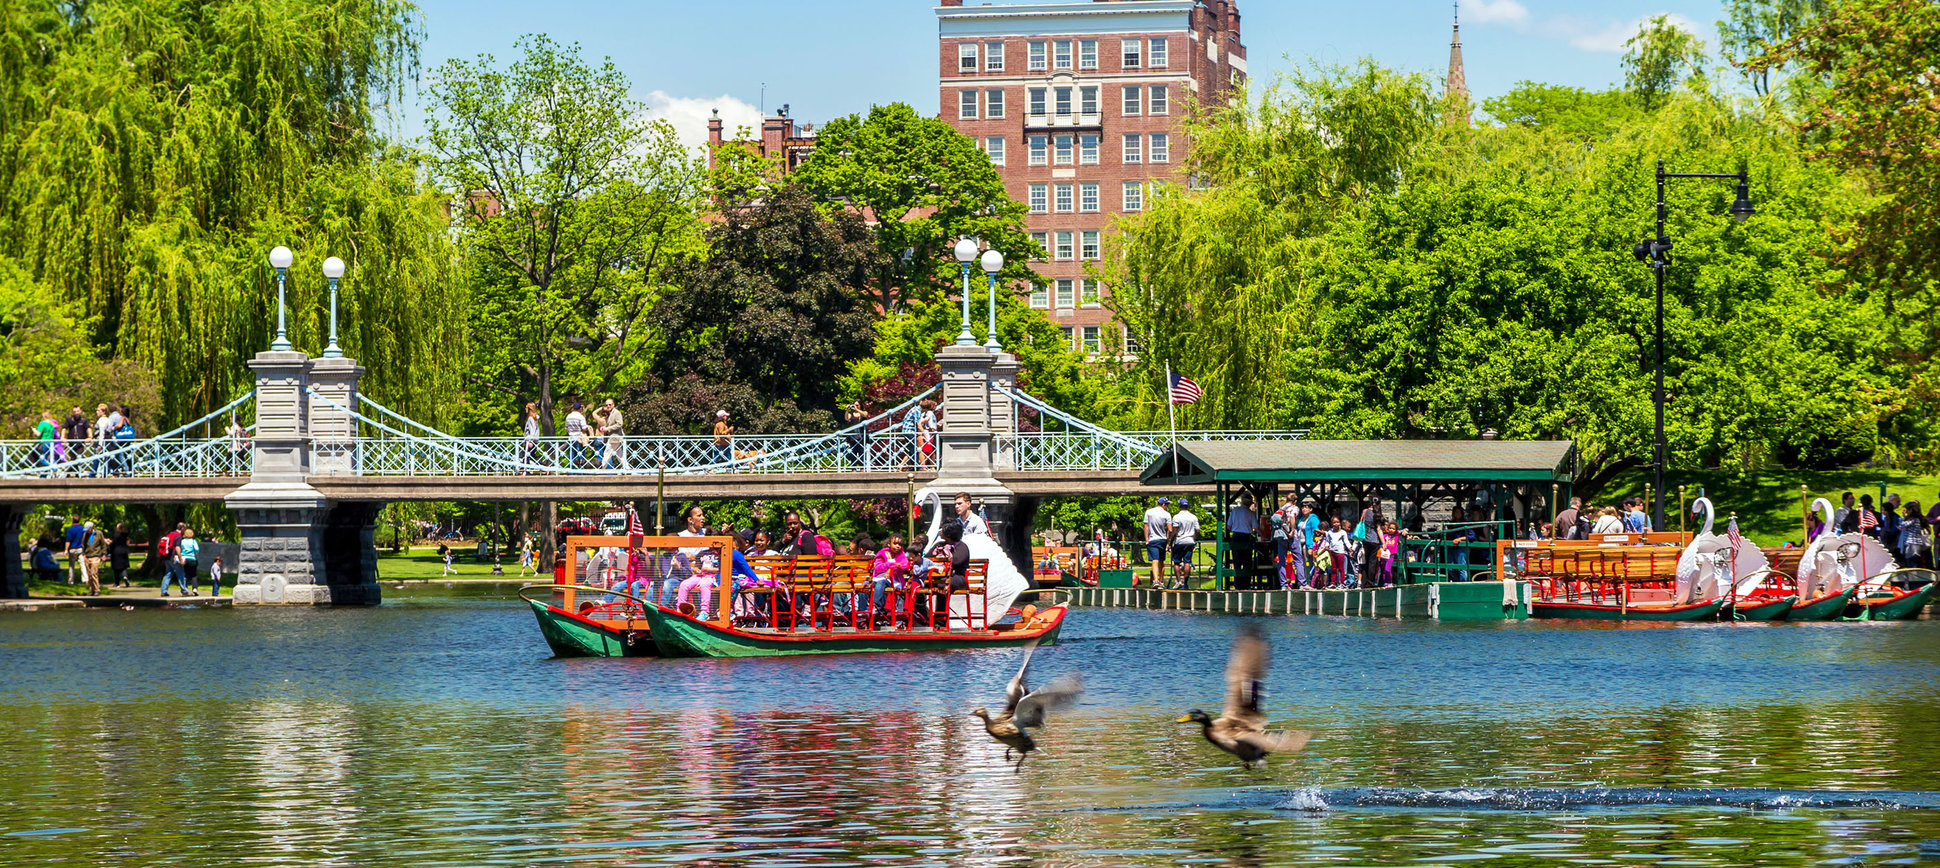 50 Ways to Take Your Boston Summer to the Next Level